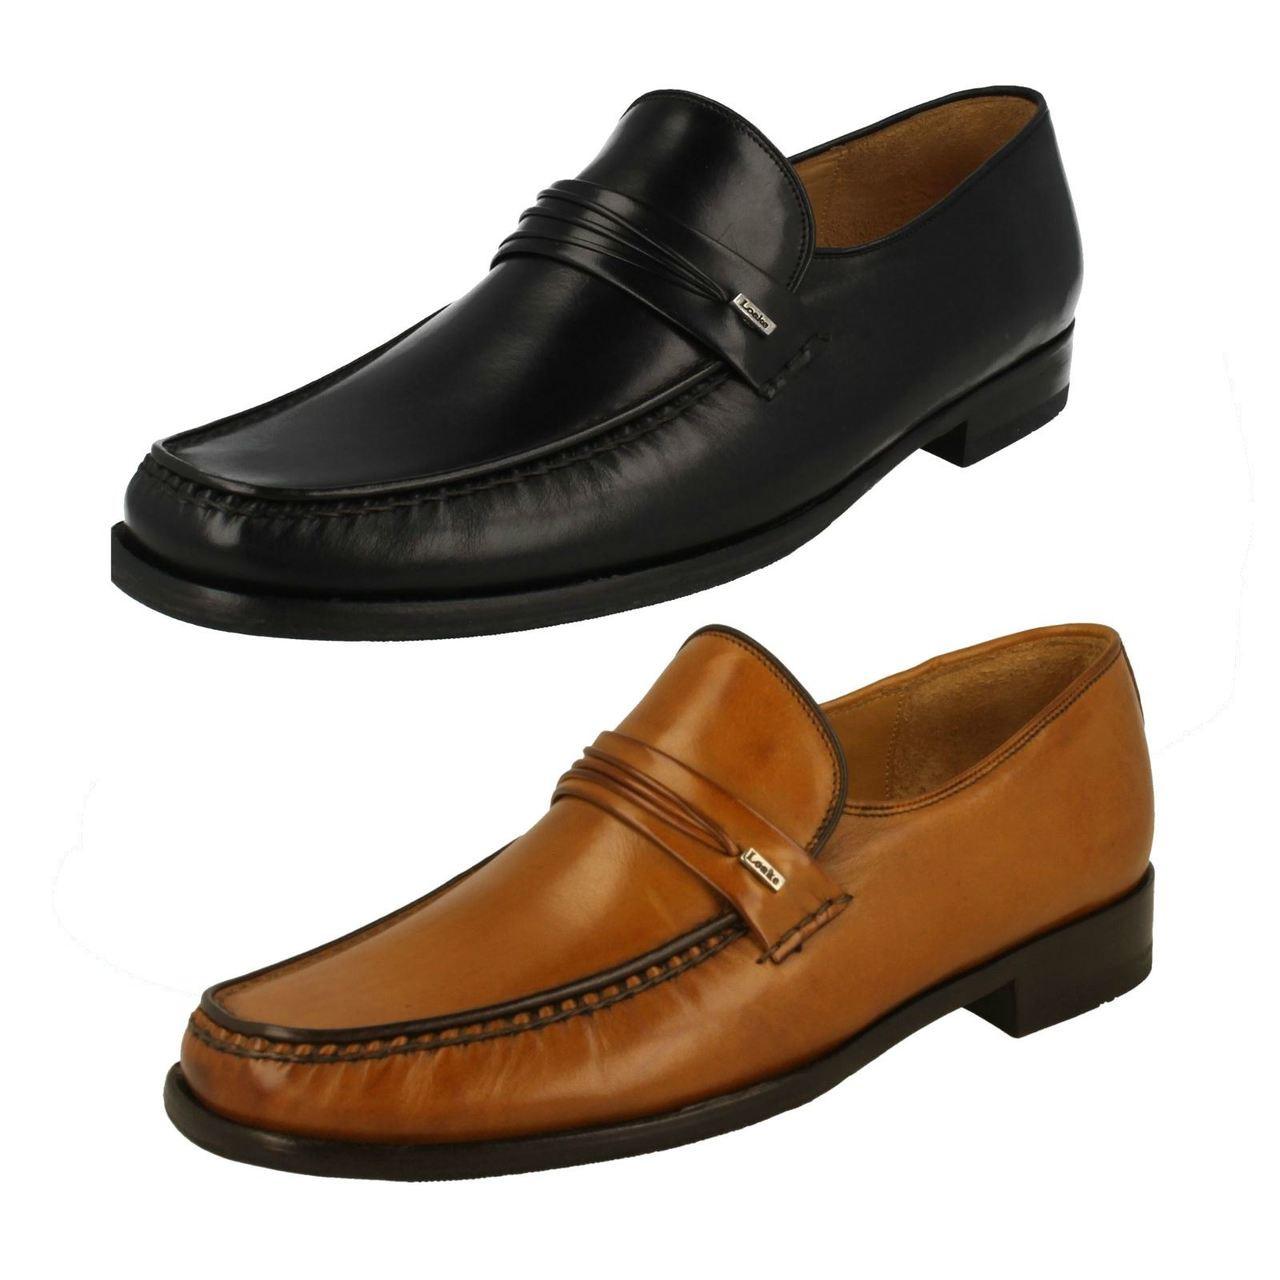 Mens Loake Leather Moccasin Slip On